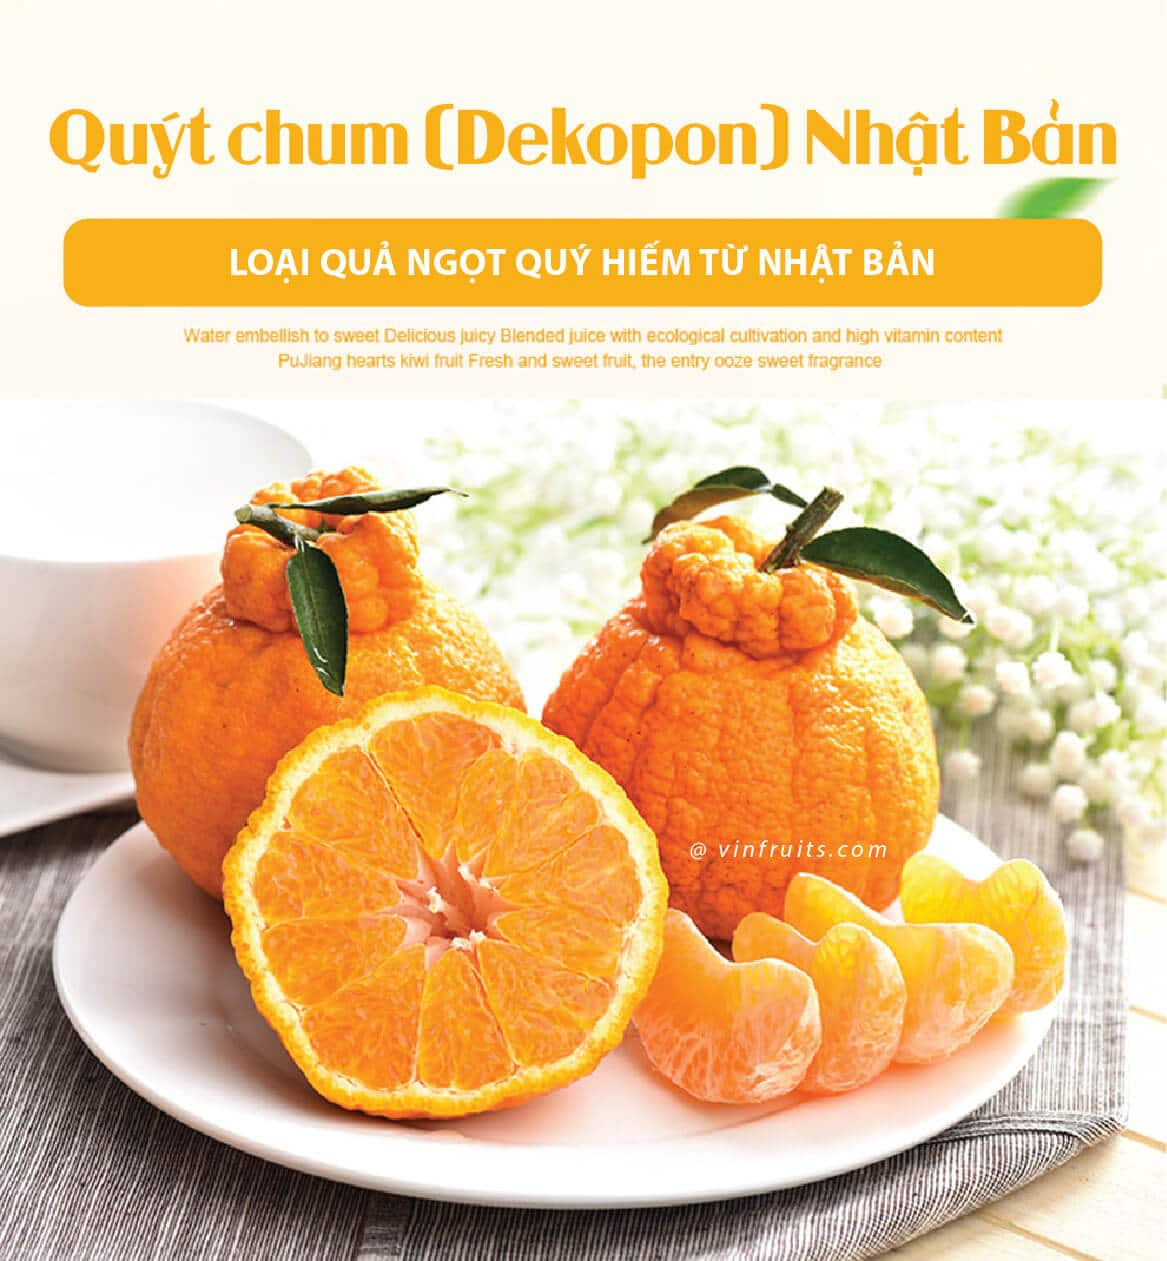 Quy chum Nhat Ban - vinfruits.com 1